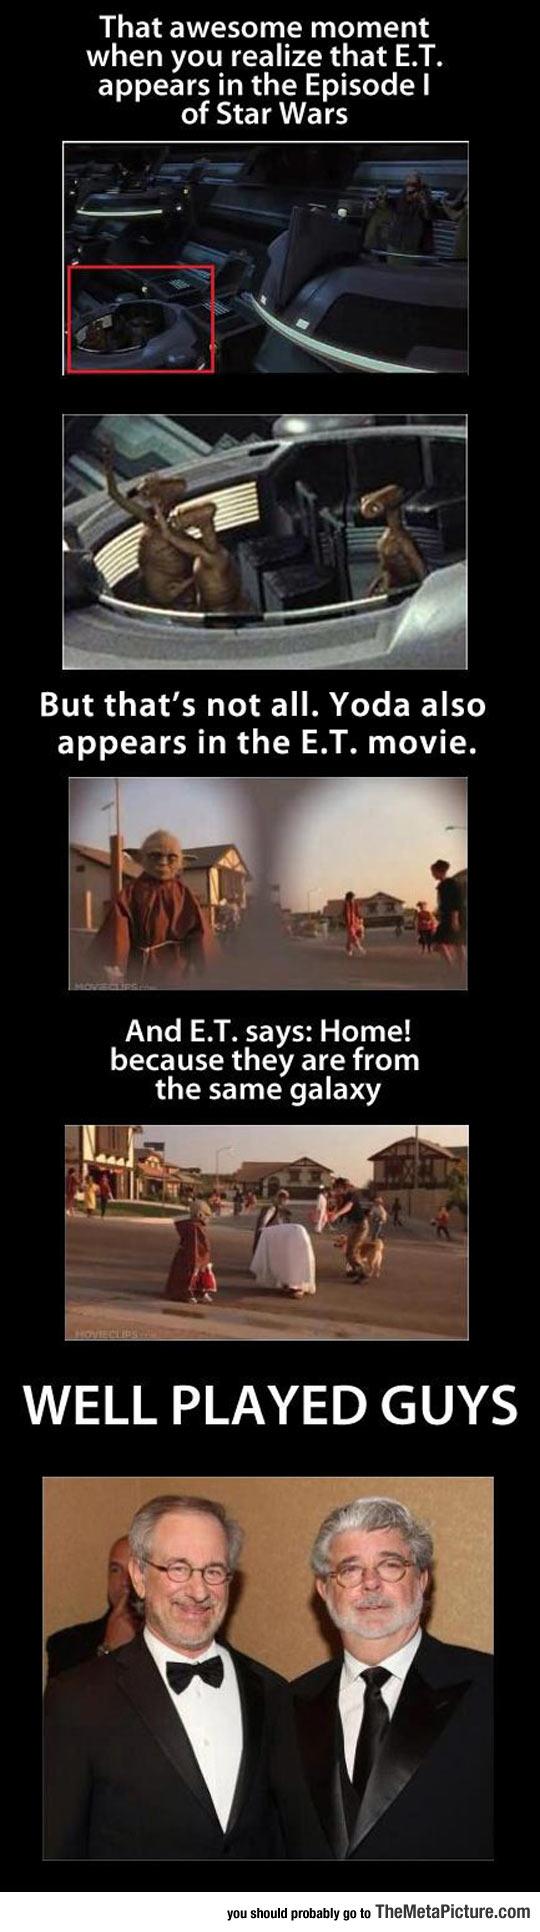 cool-ET-Star-Wars-Yoda-home-directors